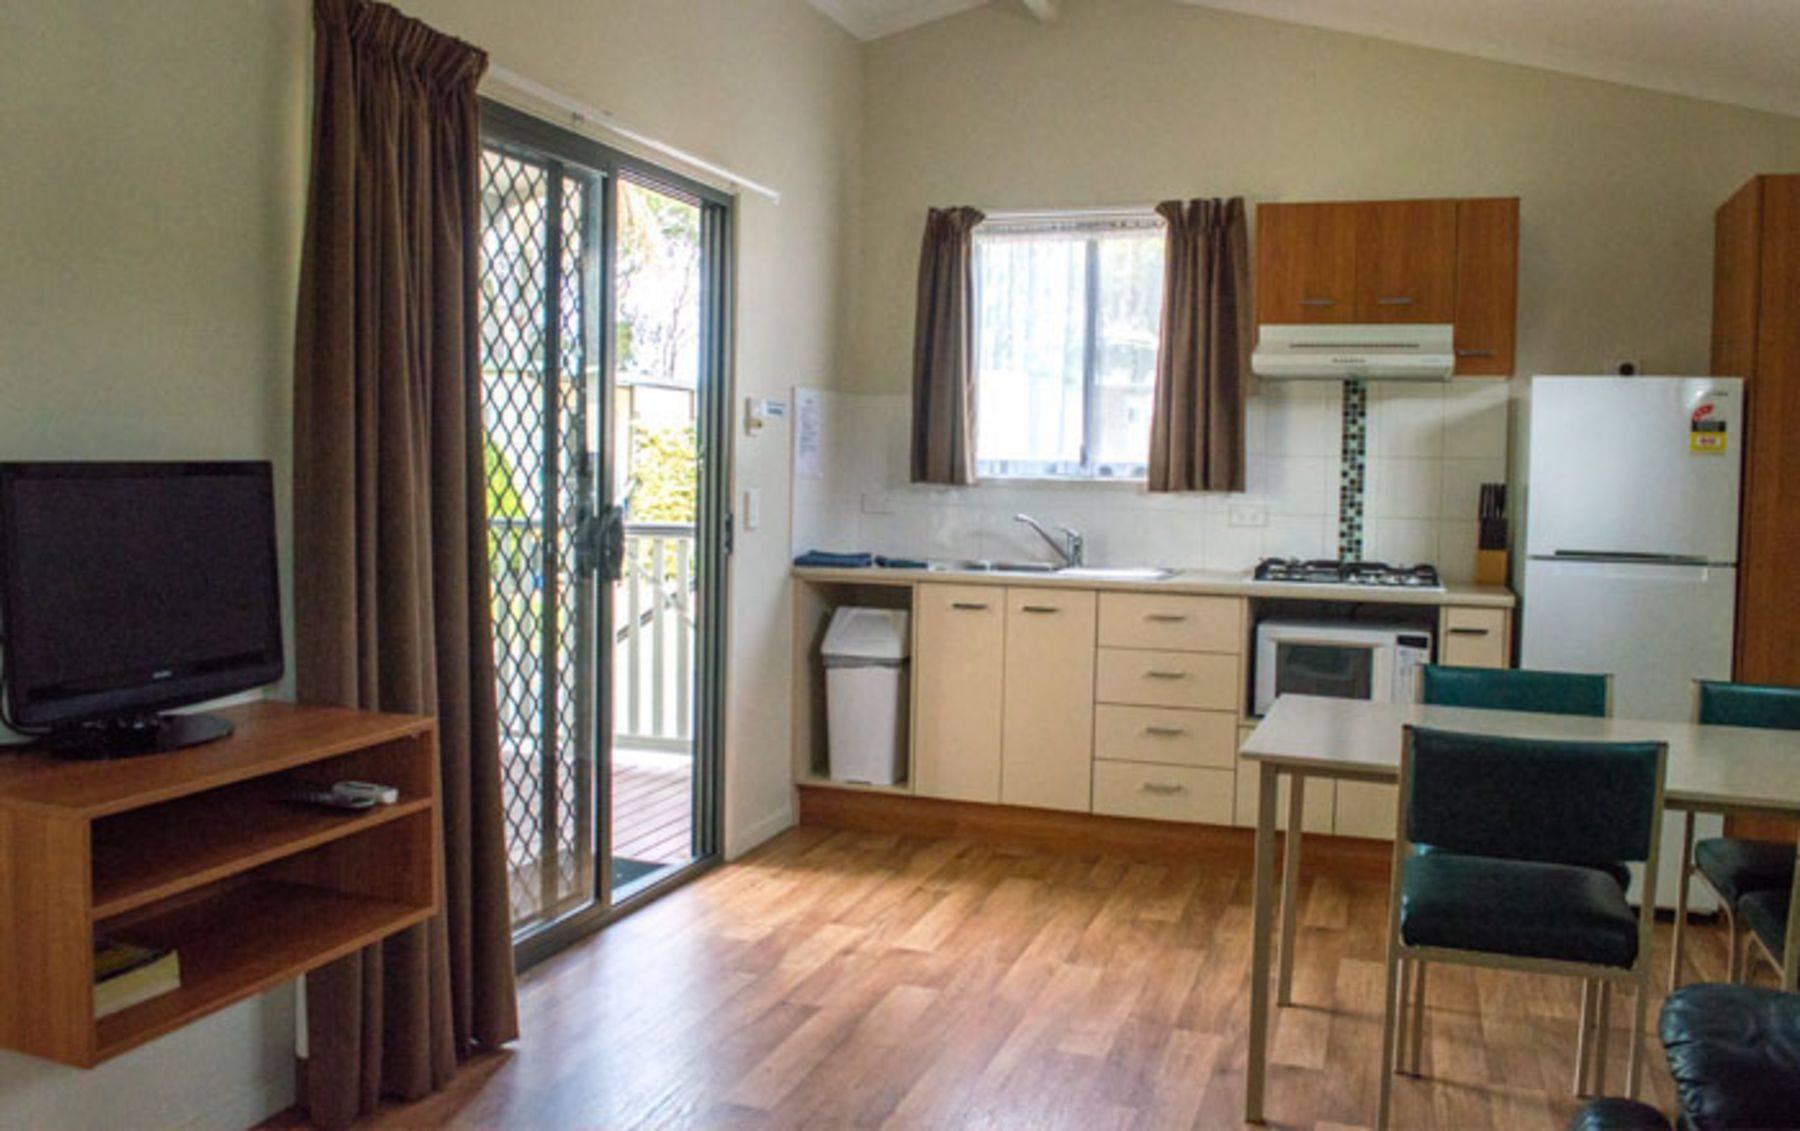 Walu Caravan Park - Budgewoi - Central Coast - NSW | Pet